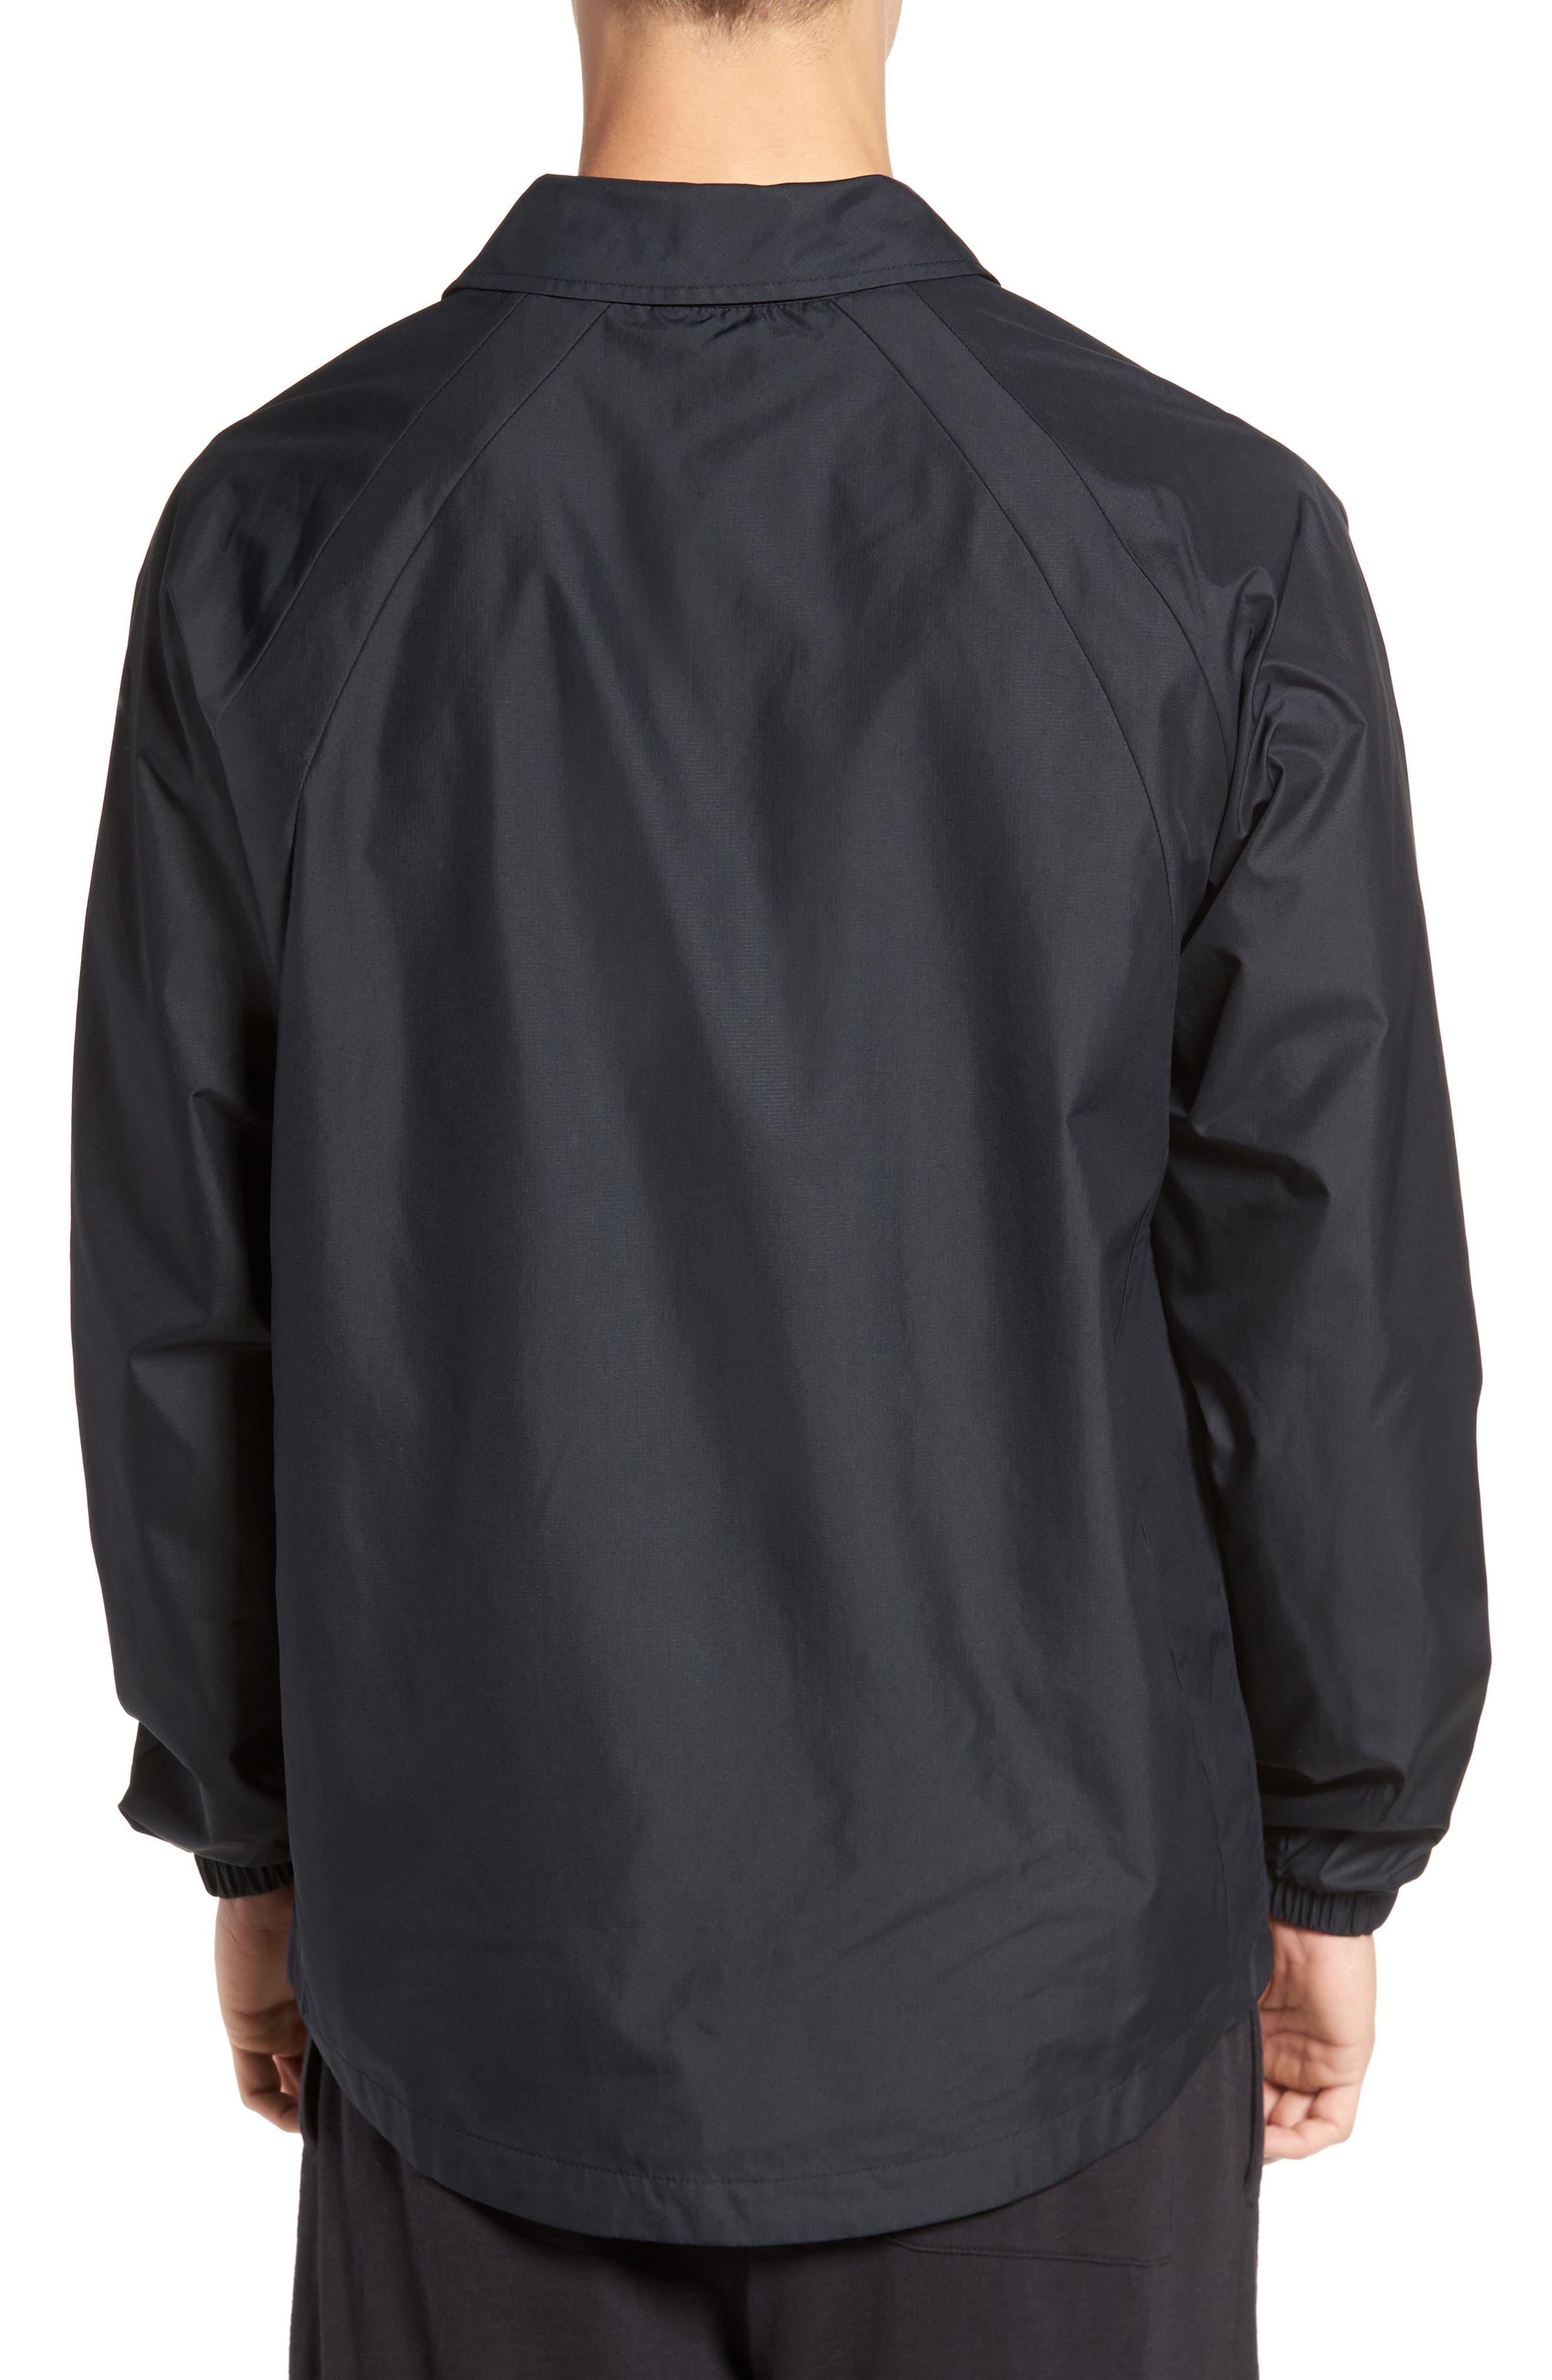 Nike Wings Coach's Jacket,                             Alternate thumbnail 2, color,                             010